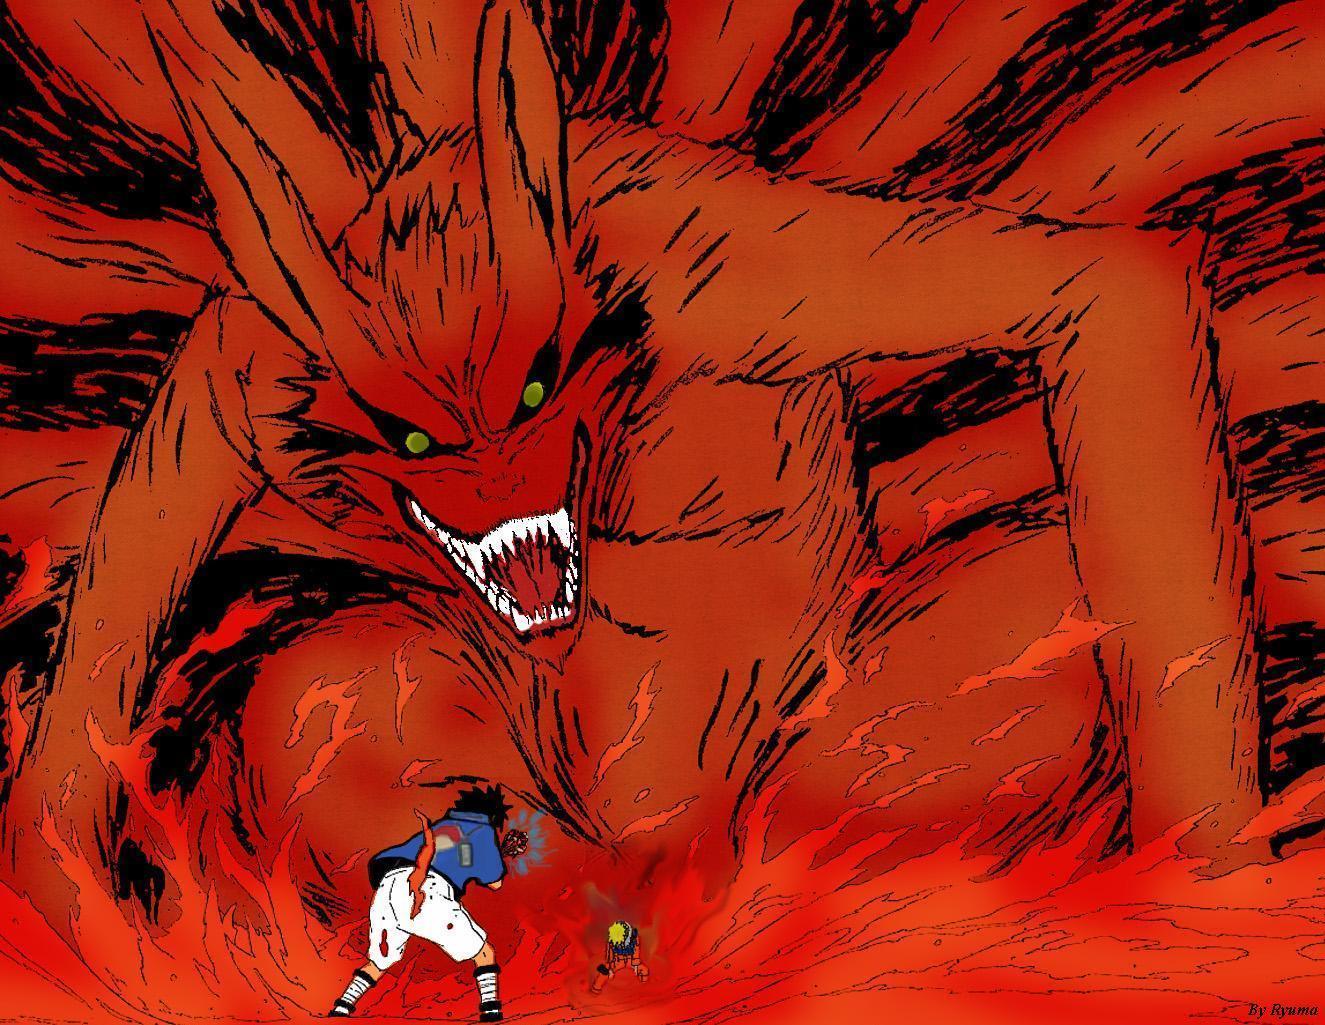 meilleurs images du manga naruto naruto vs sasuke